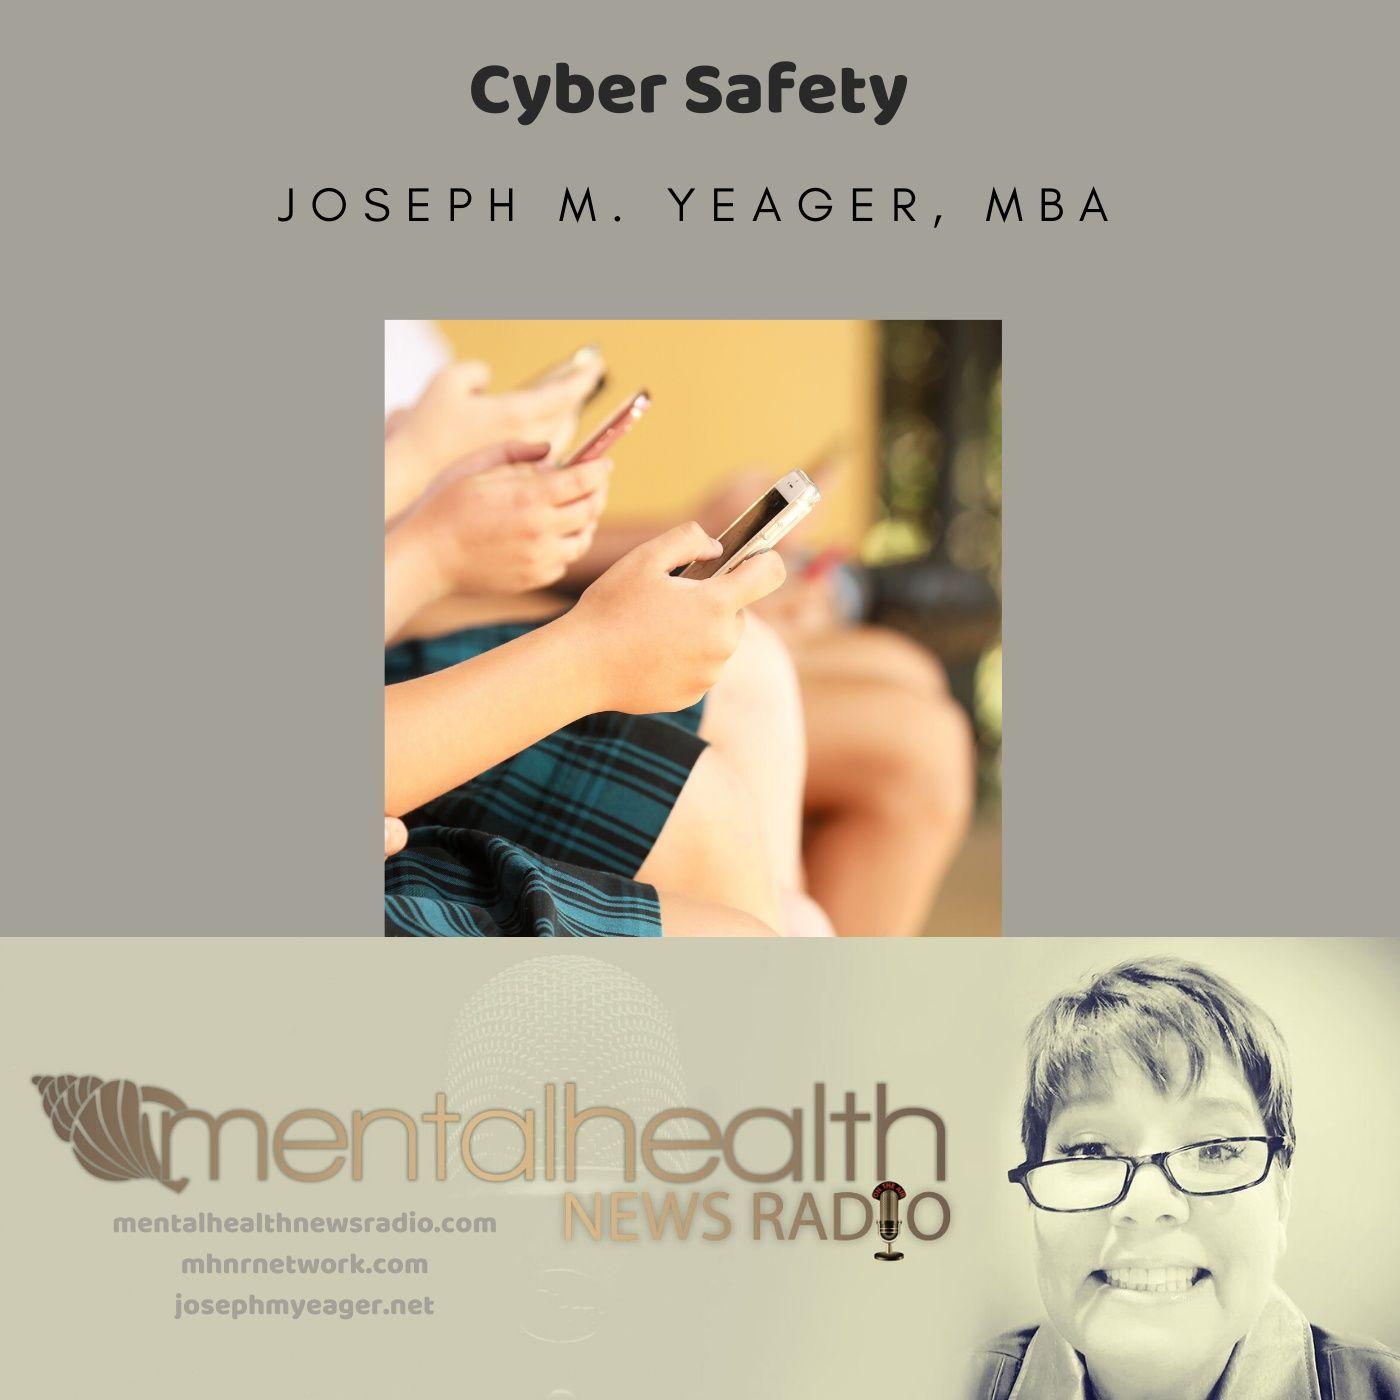 Mental Health News Radio - Cyber Safety